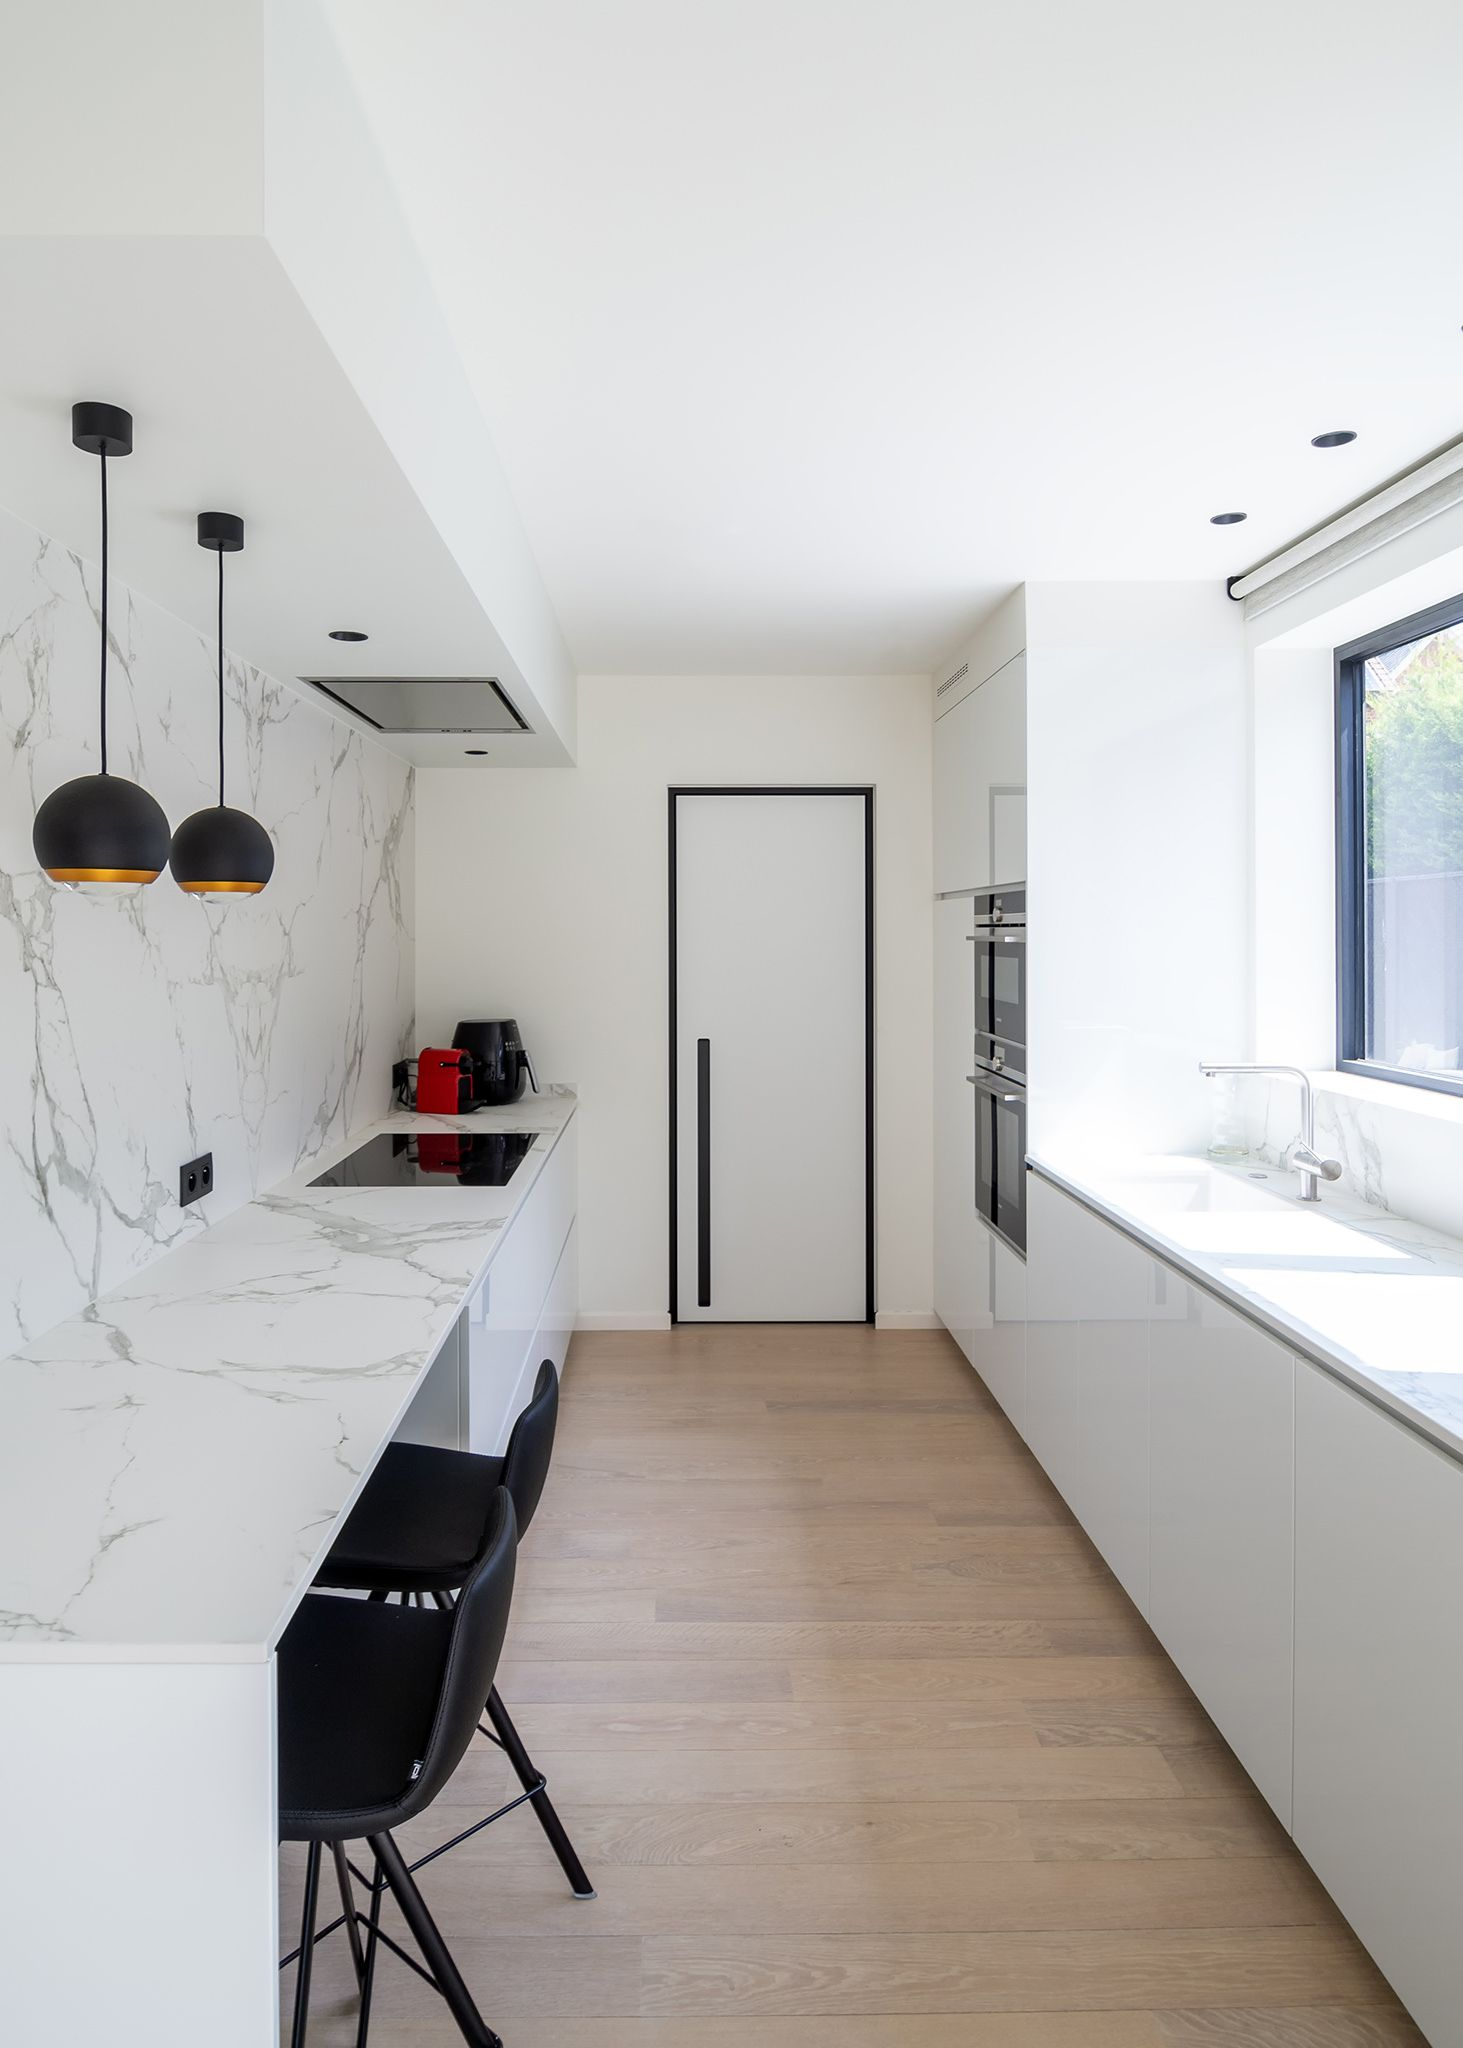 Modern white interior door with a minimal black door frame